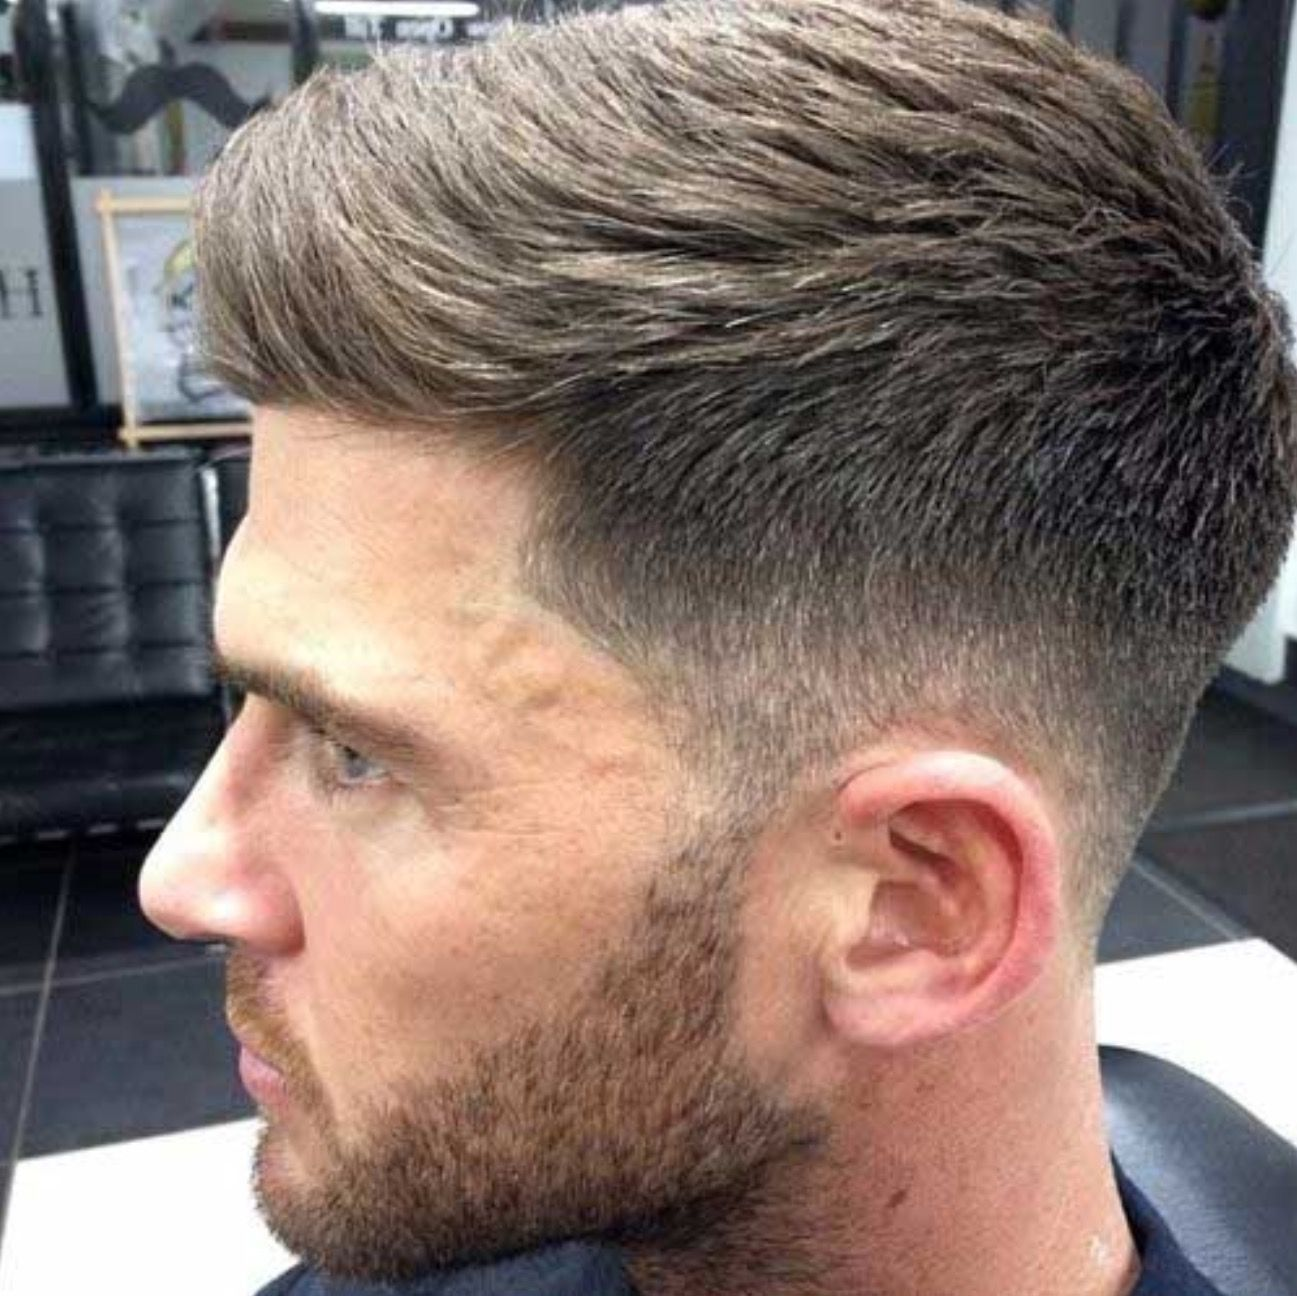 short haircut ideas for thick hair, men's hairstyles (2015/2016